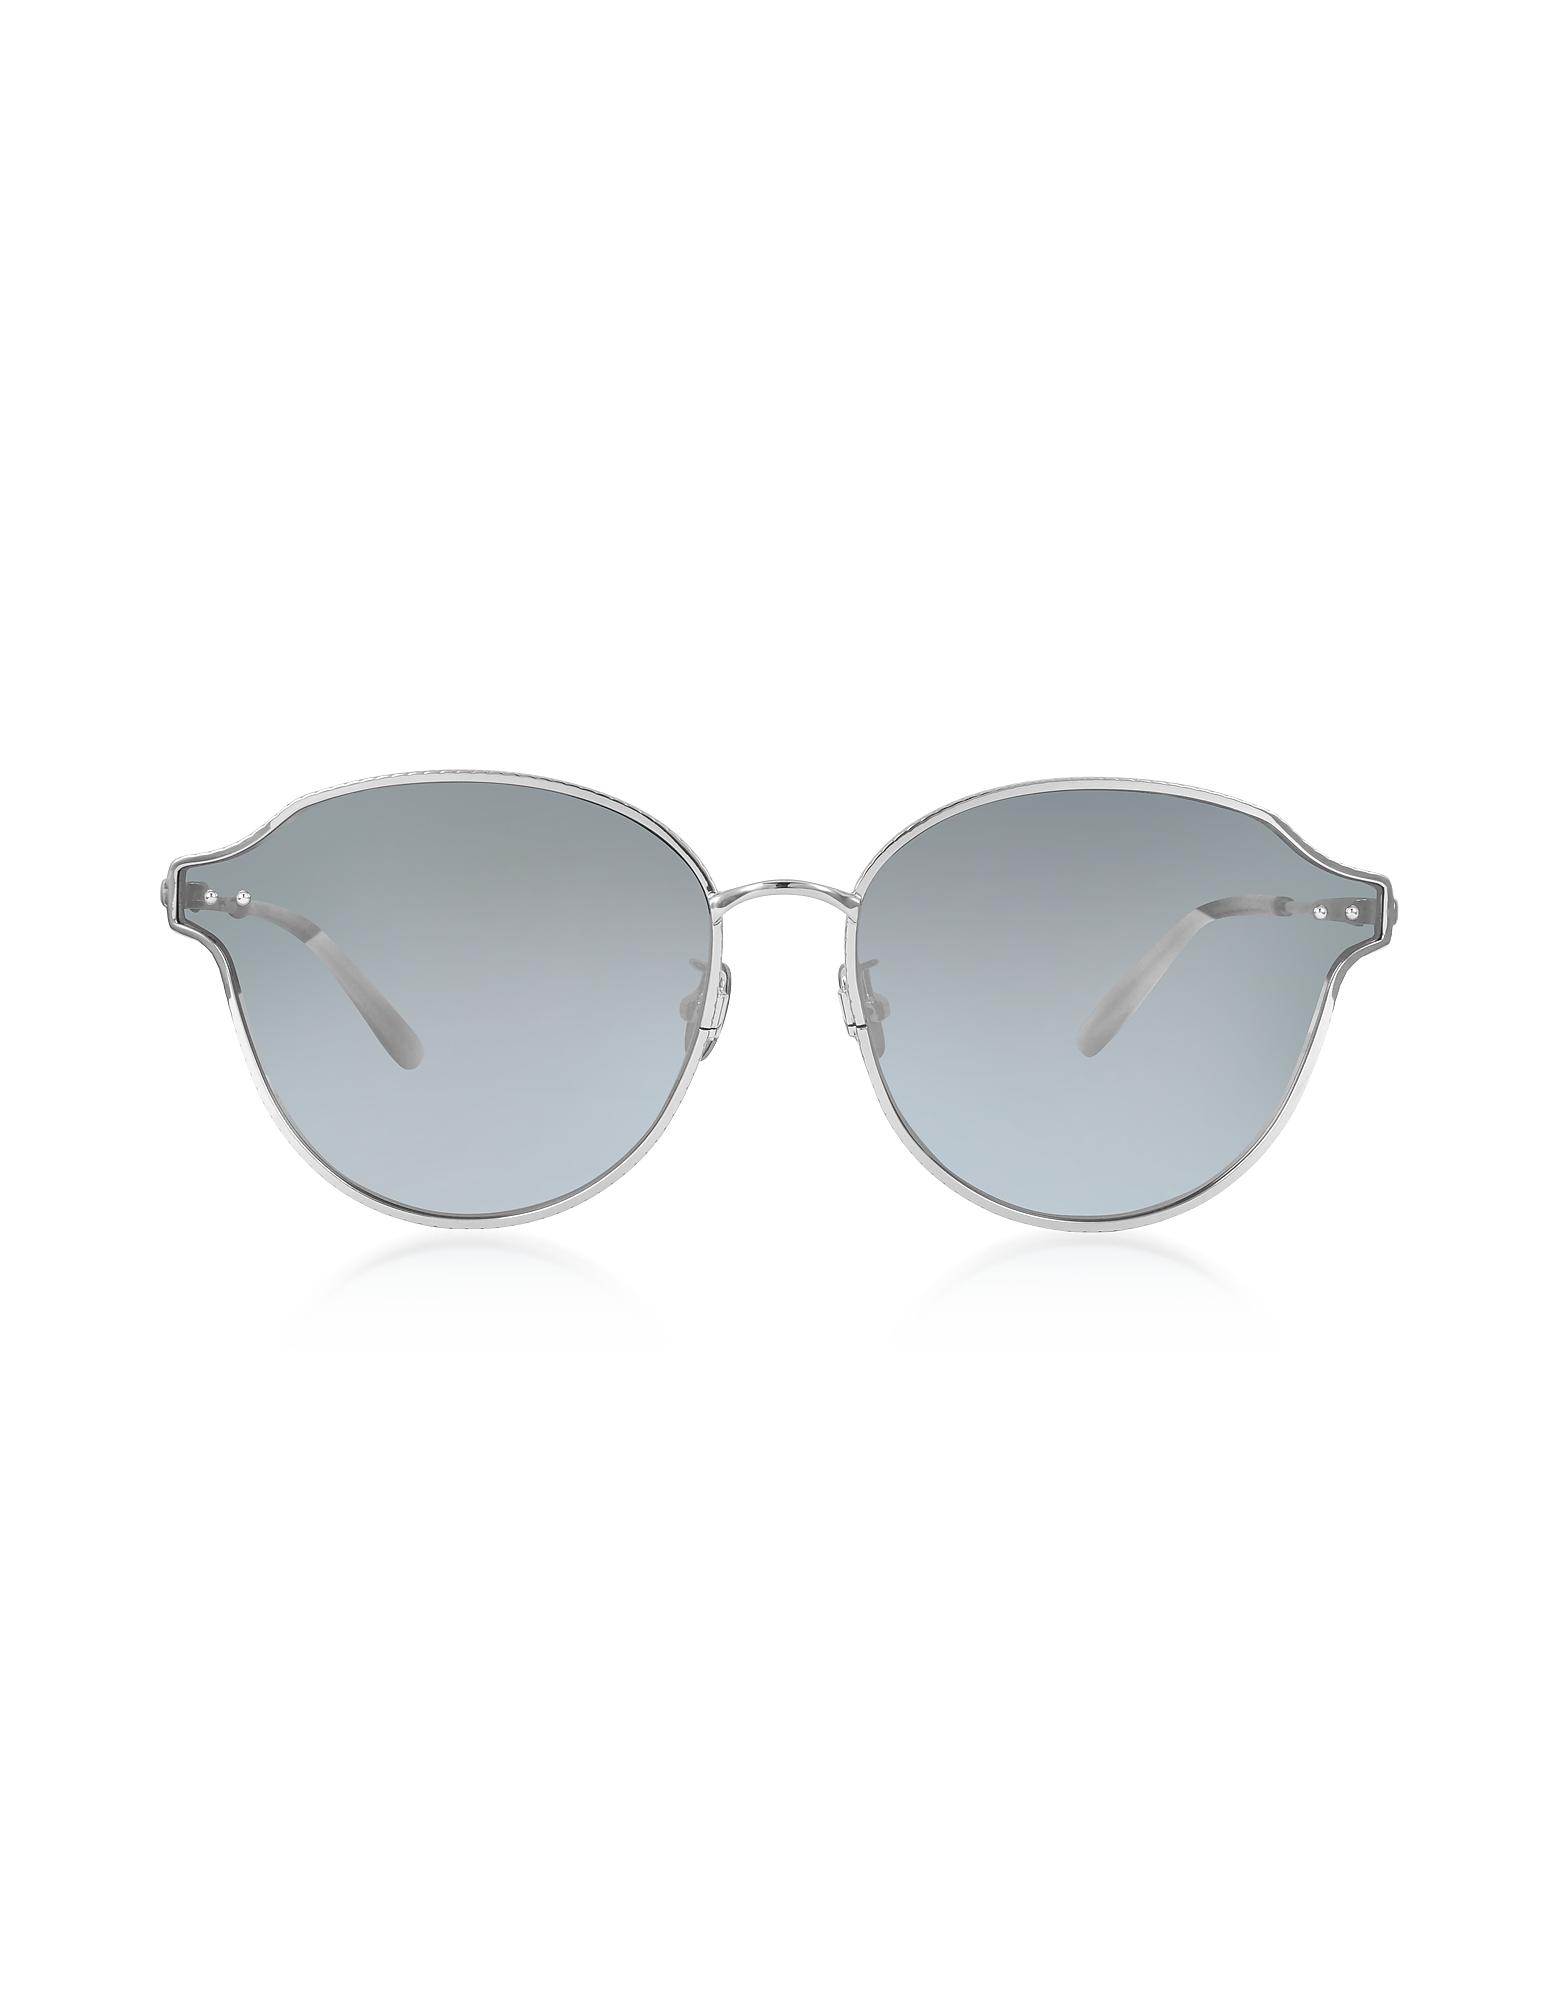 Bottega Veneta Sunglasses, BV0156SK Unisex Metal Sunglasses